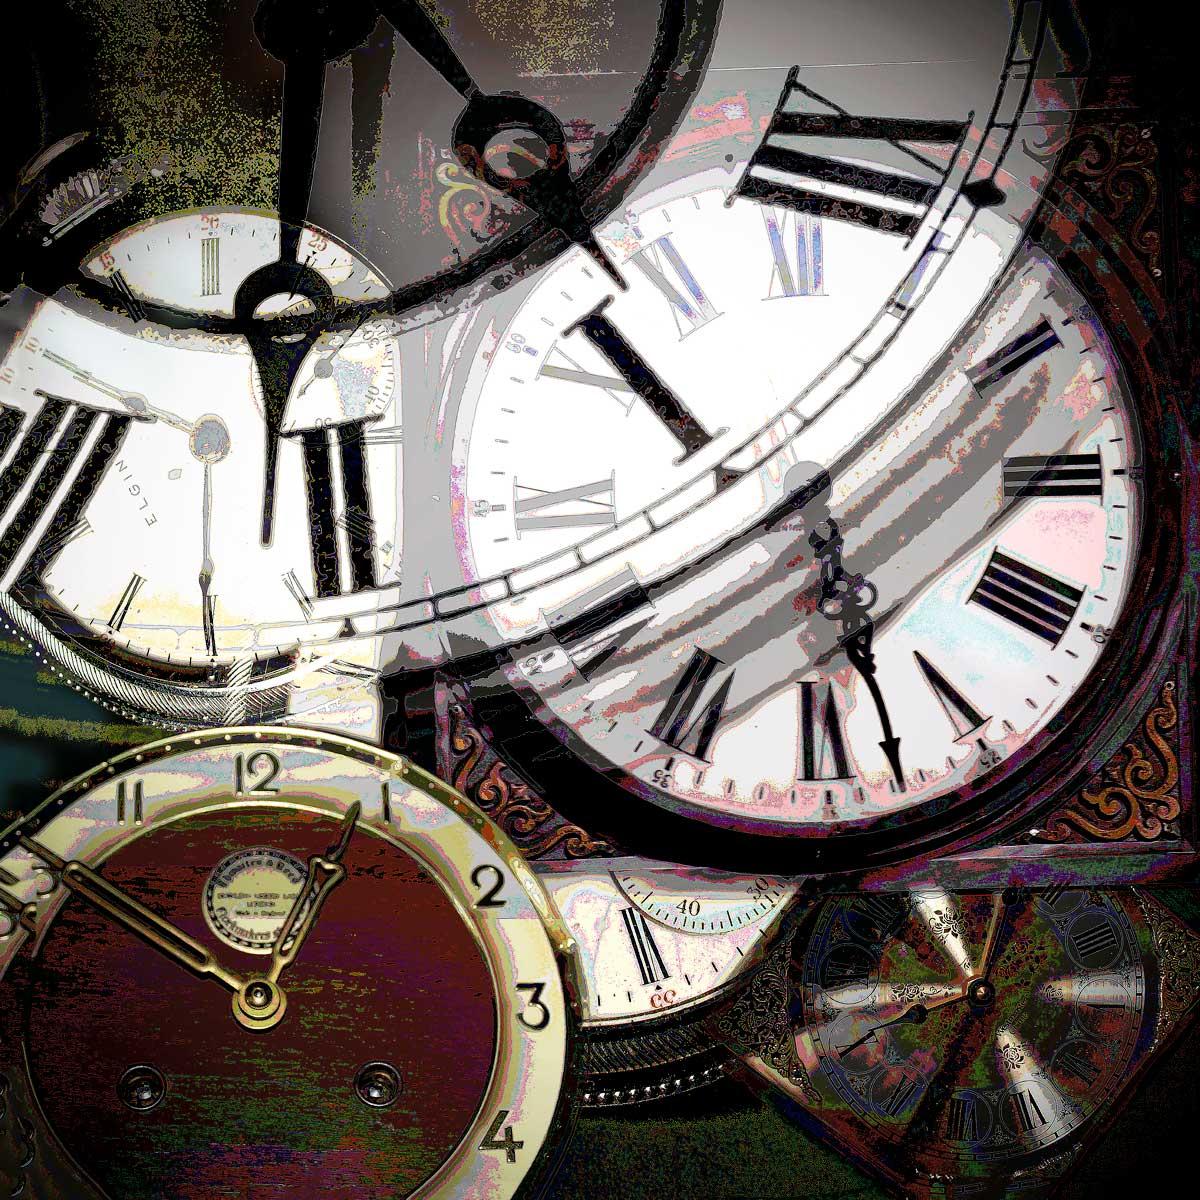 Time After Time, After Time, After. .. .